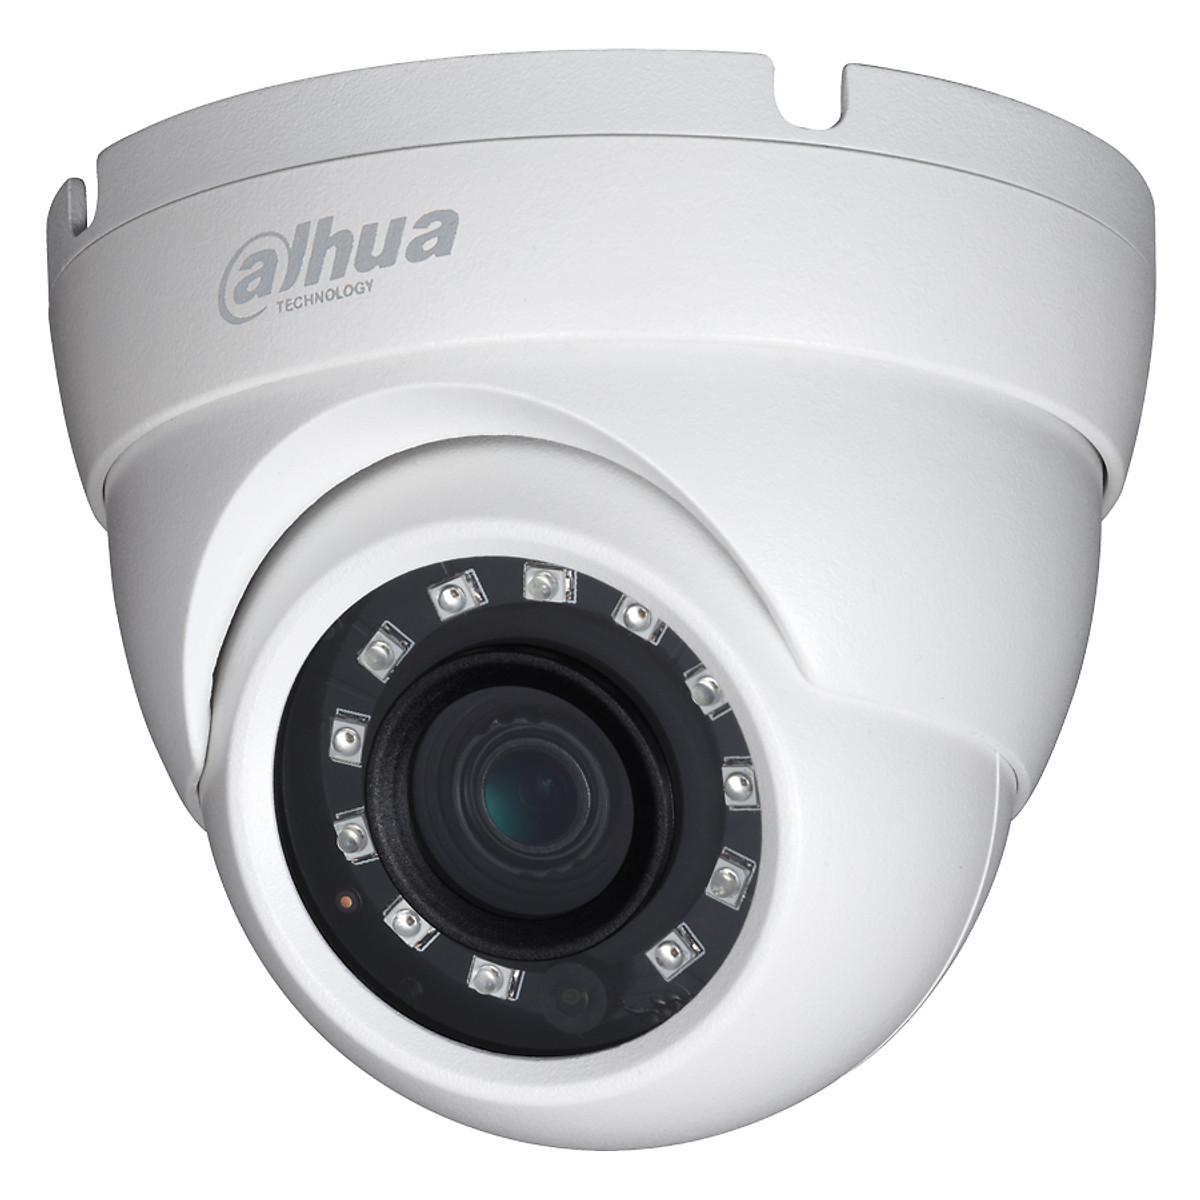 Camera Dahua HAC-HDW2231SP 2.0 Megapixel – Hàng Nhập Khẩu